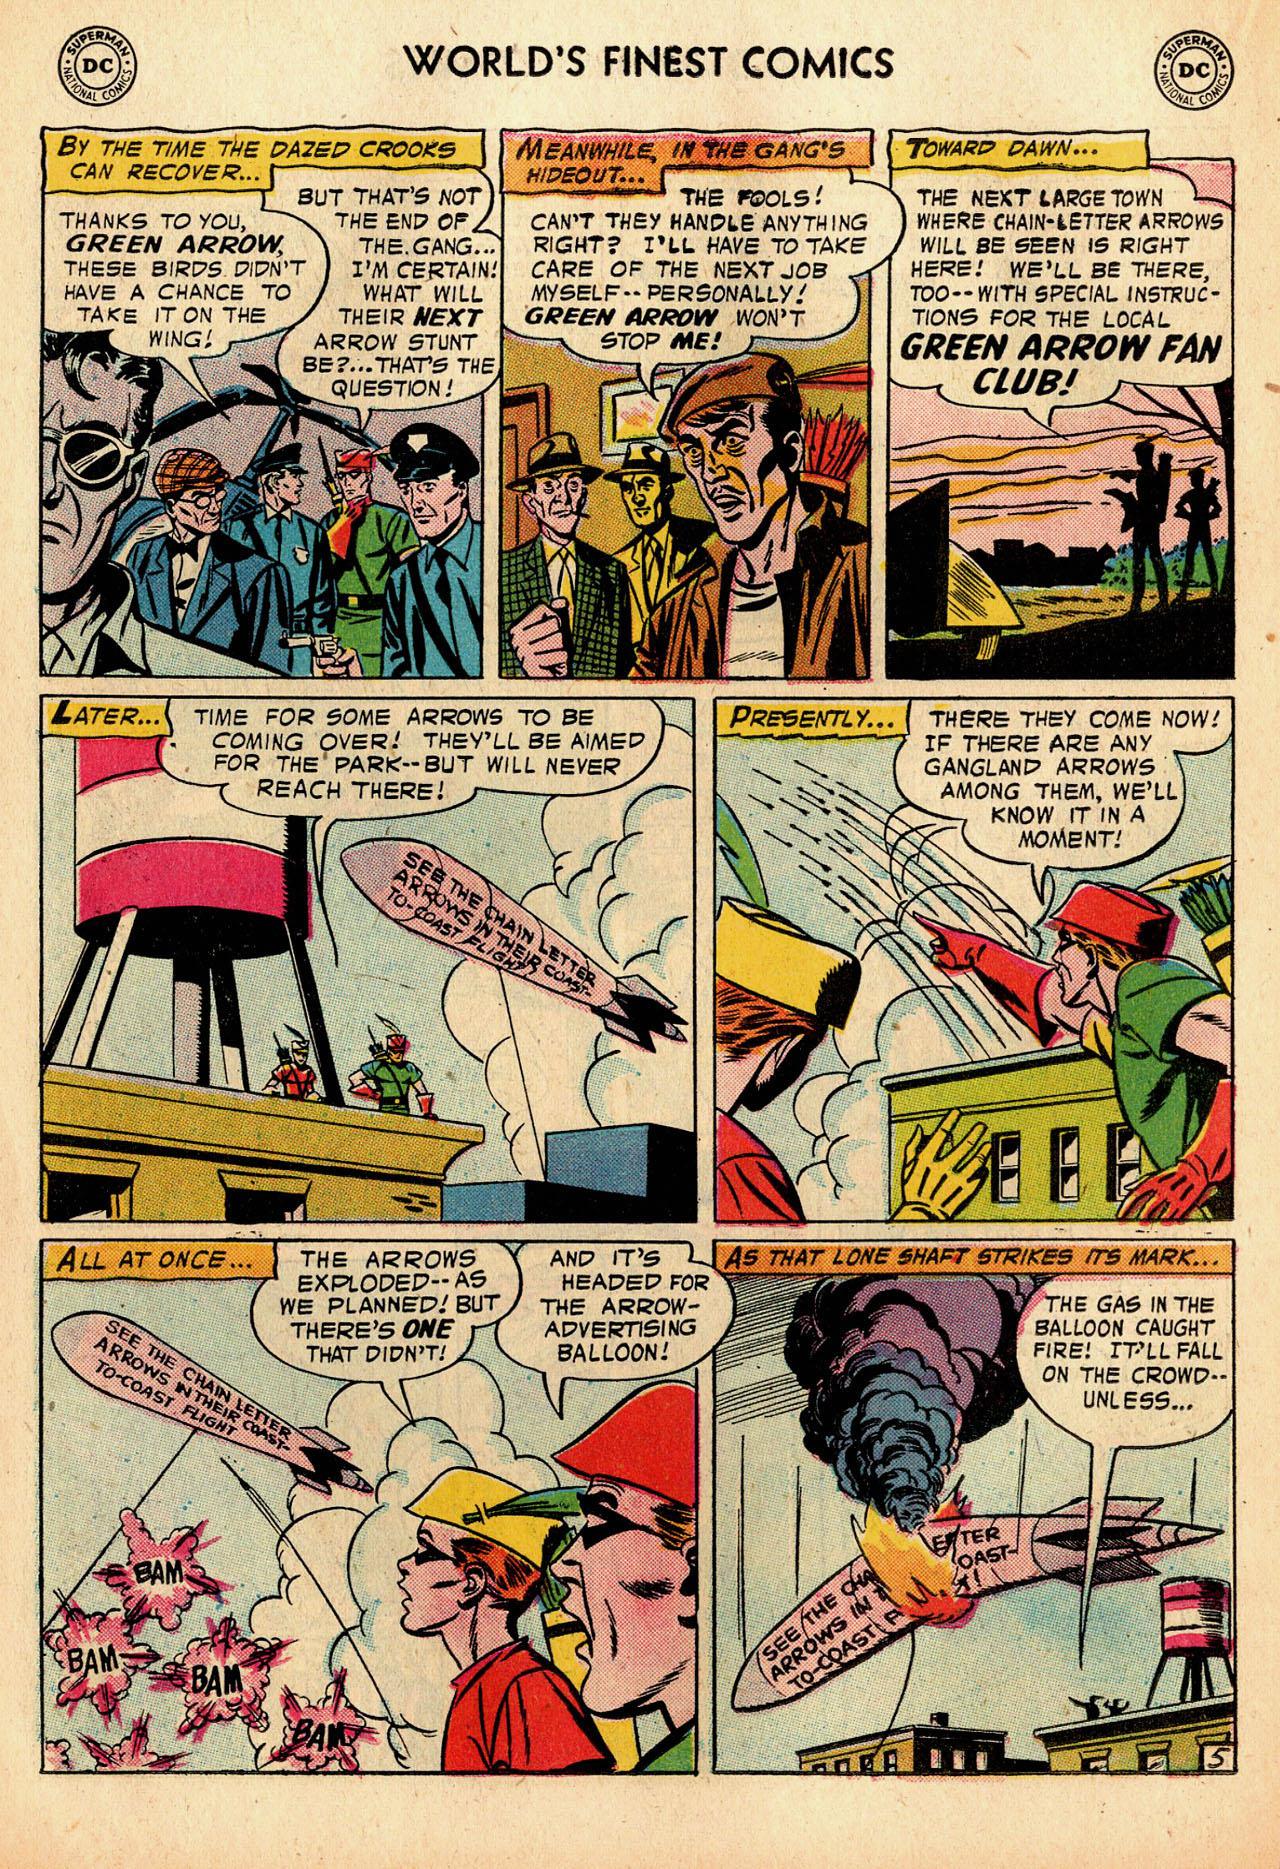 Read online World's Finest Comics comic -  Issue #91 - 22